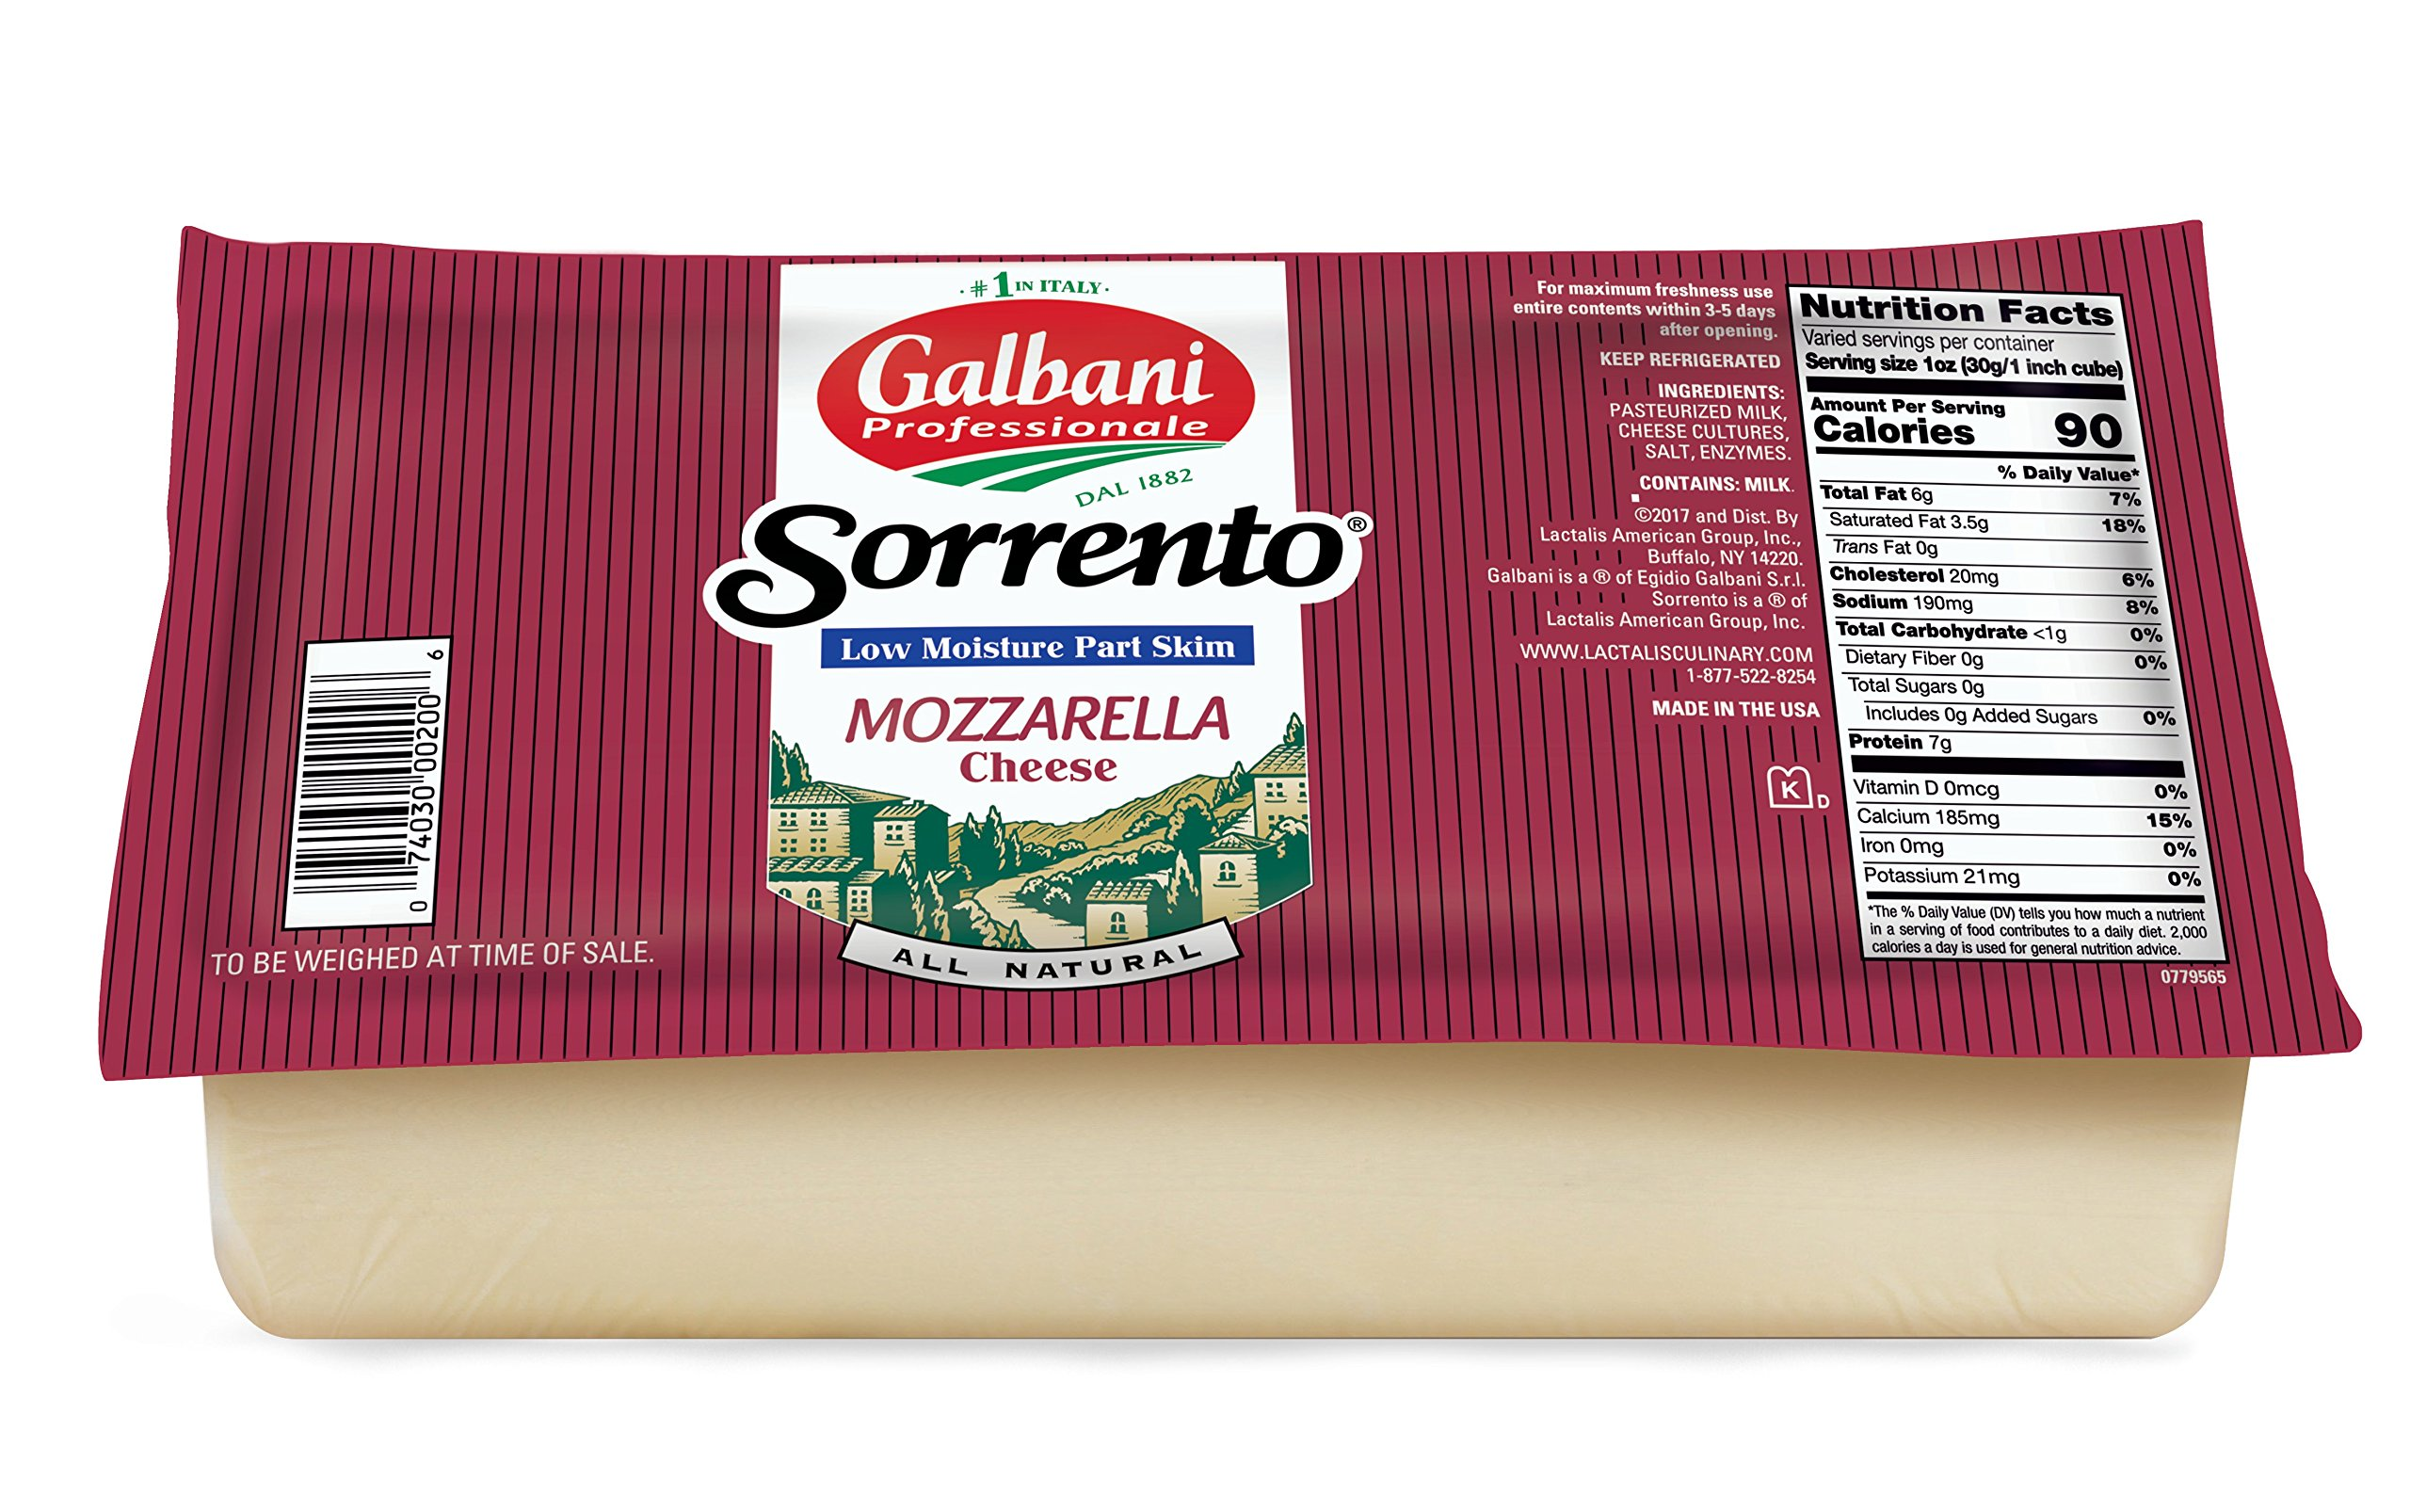 Galbani Low Moisture Part Skim Mozzarella Cheese Block 5 lb--Pack of 8